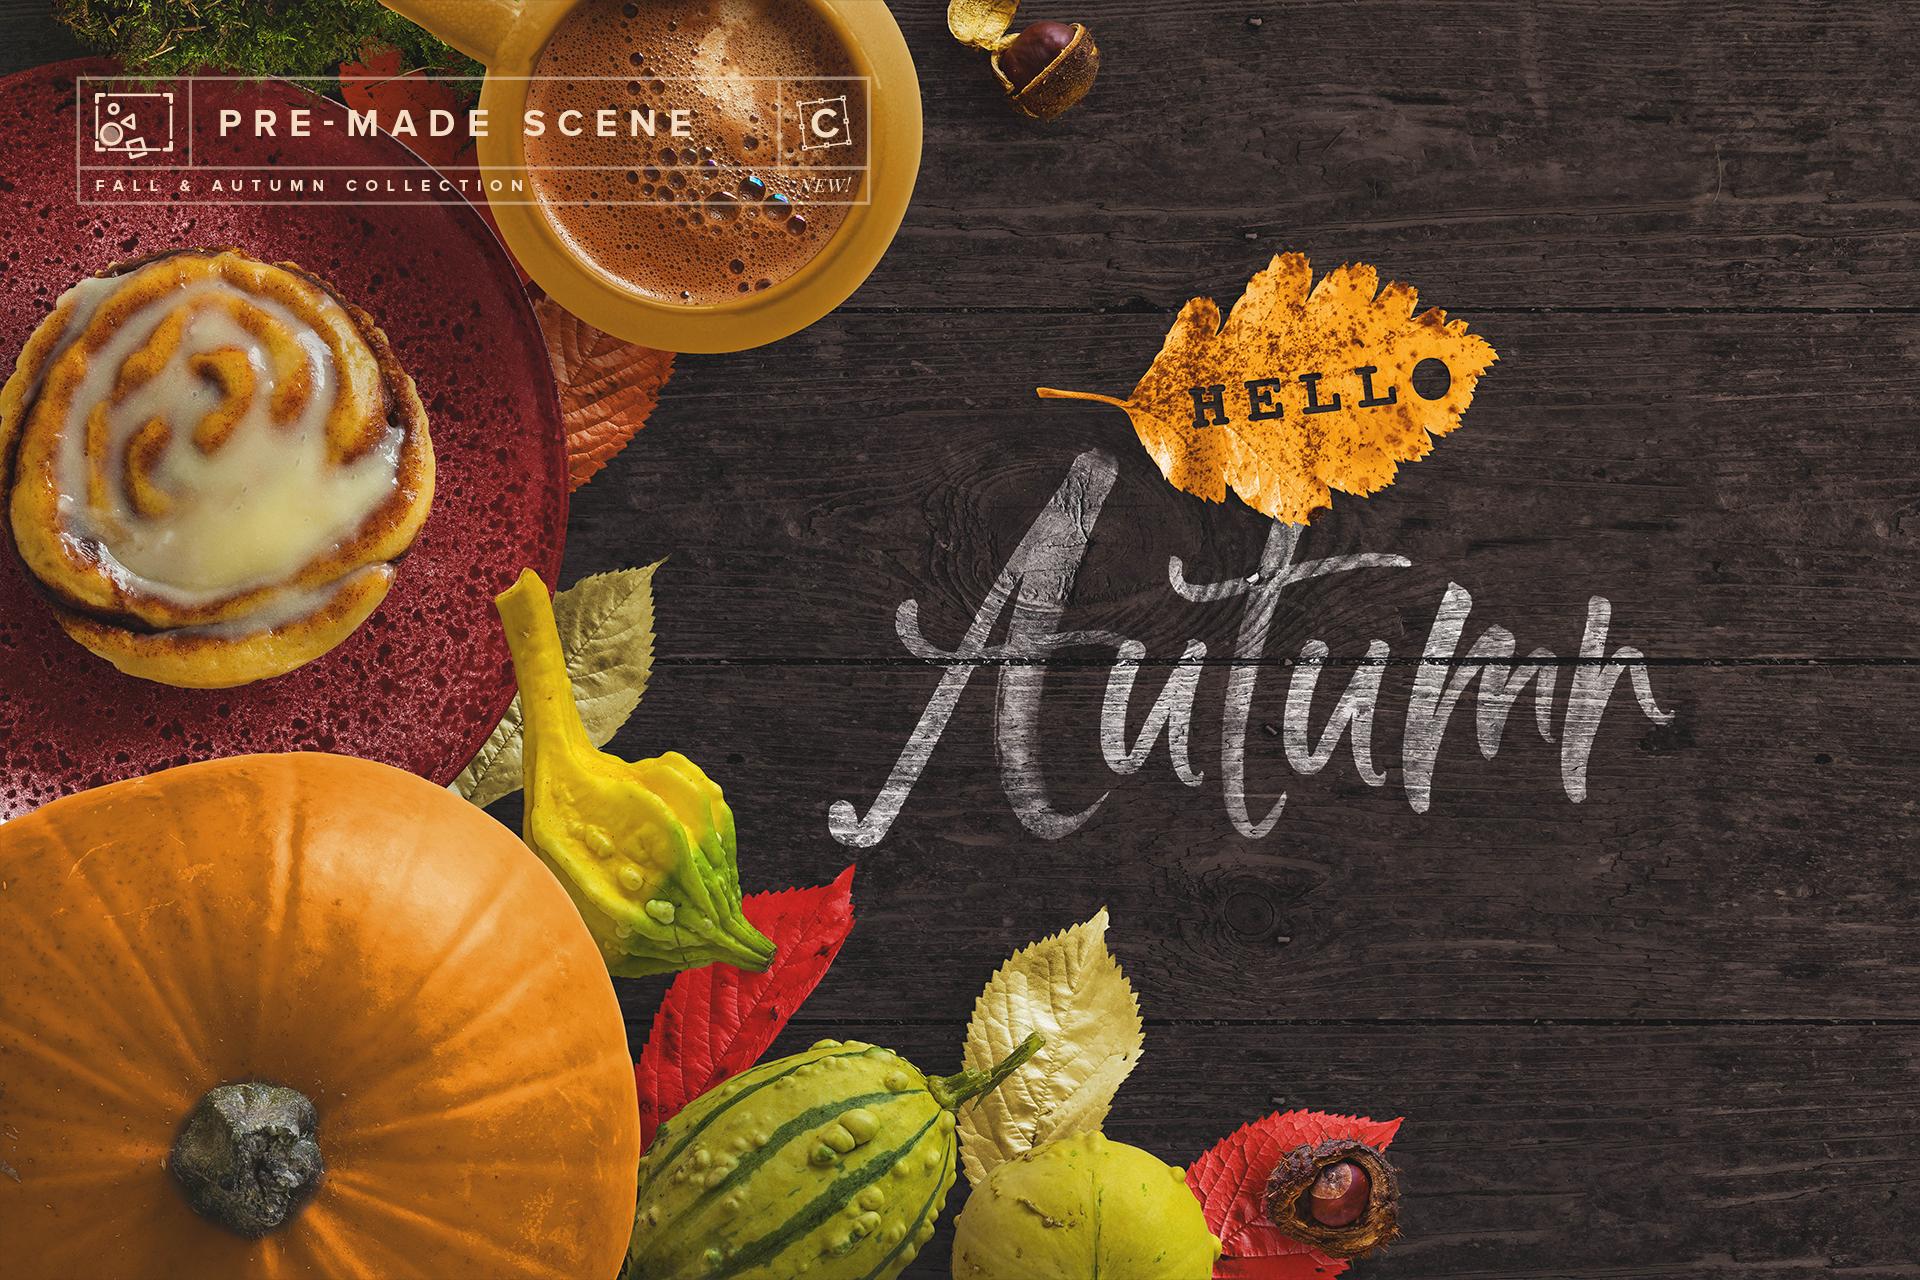 new scene 014 fall and autumn collection customscene